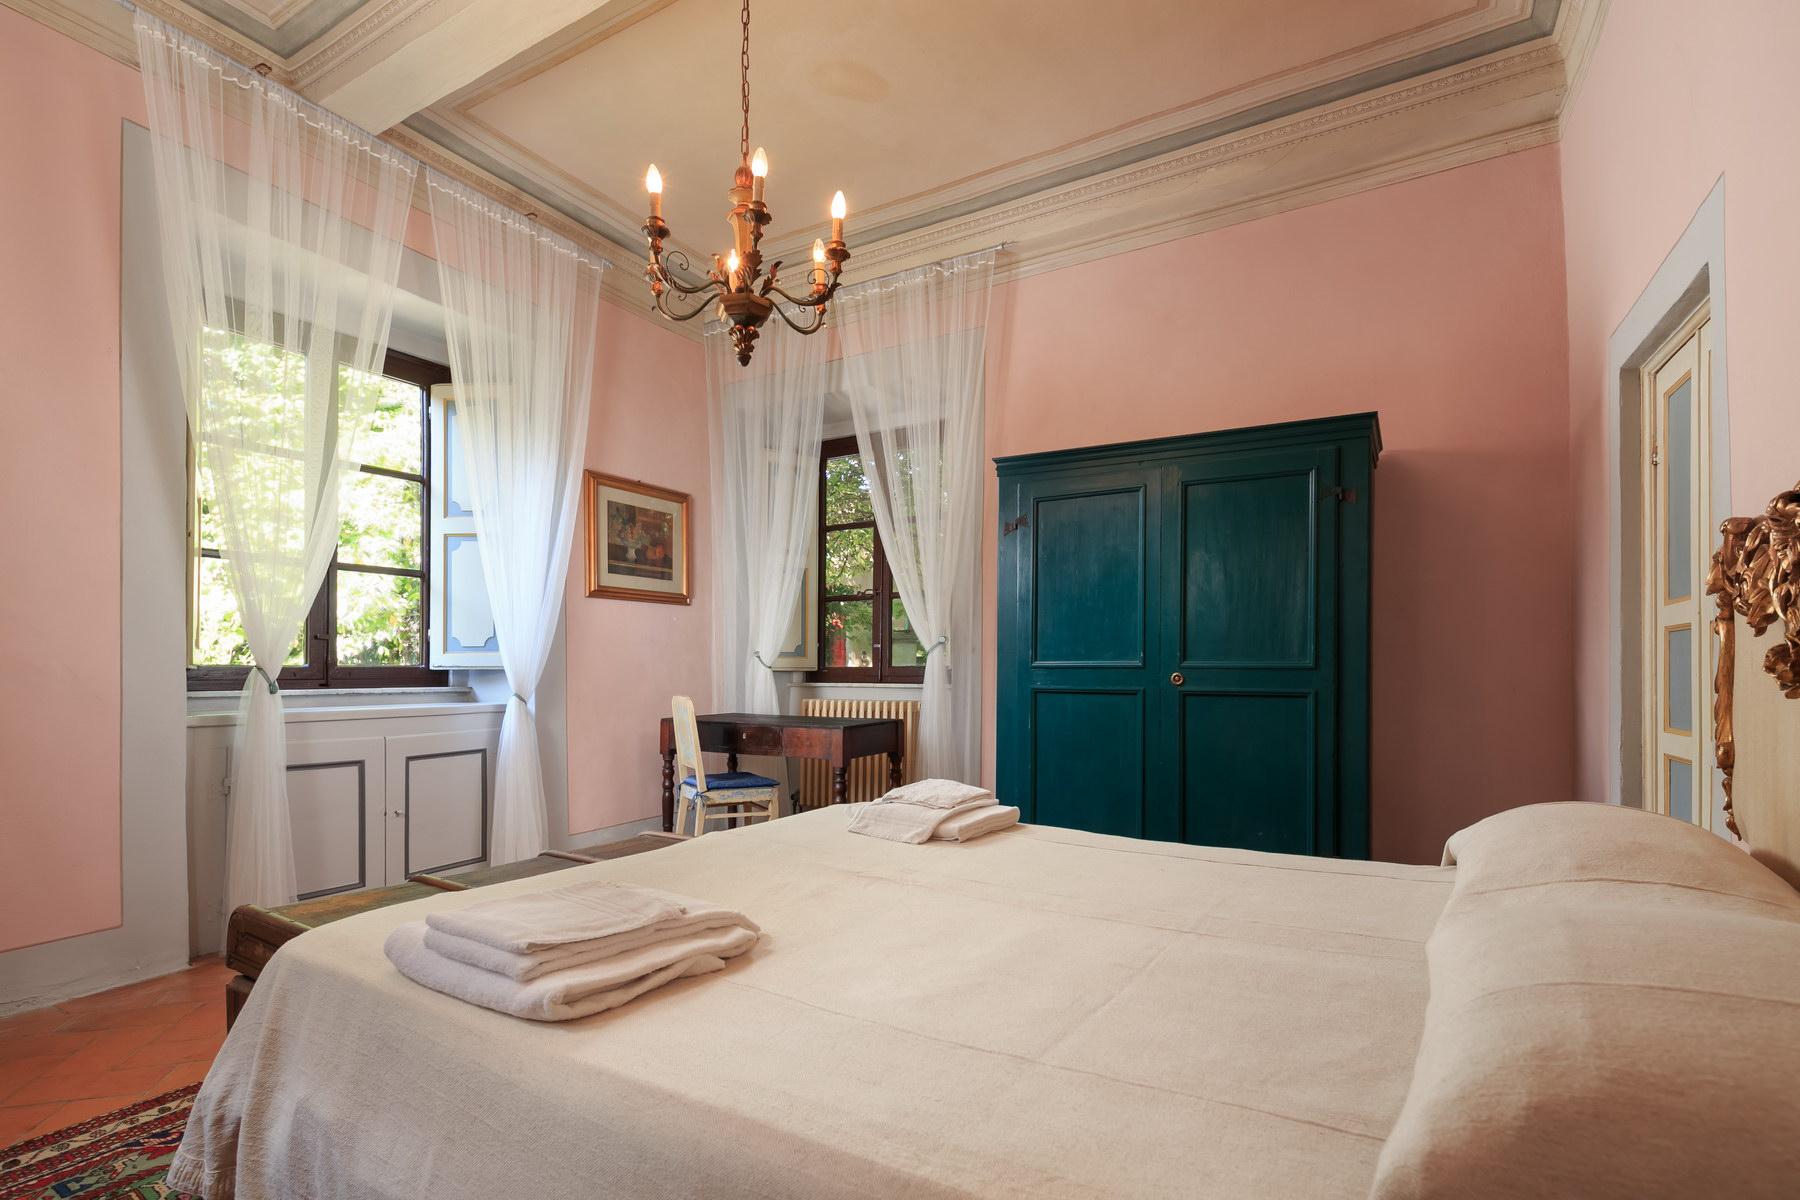 Villa in Vendita a Capannori: 5 locali, 570 mq - Foto 18